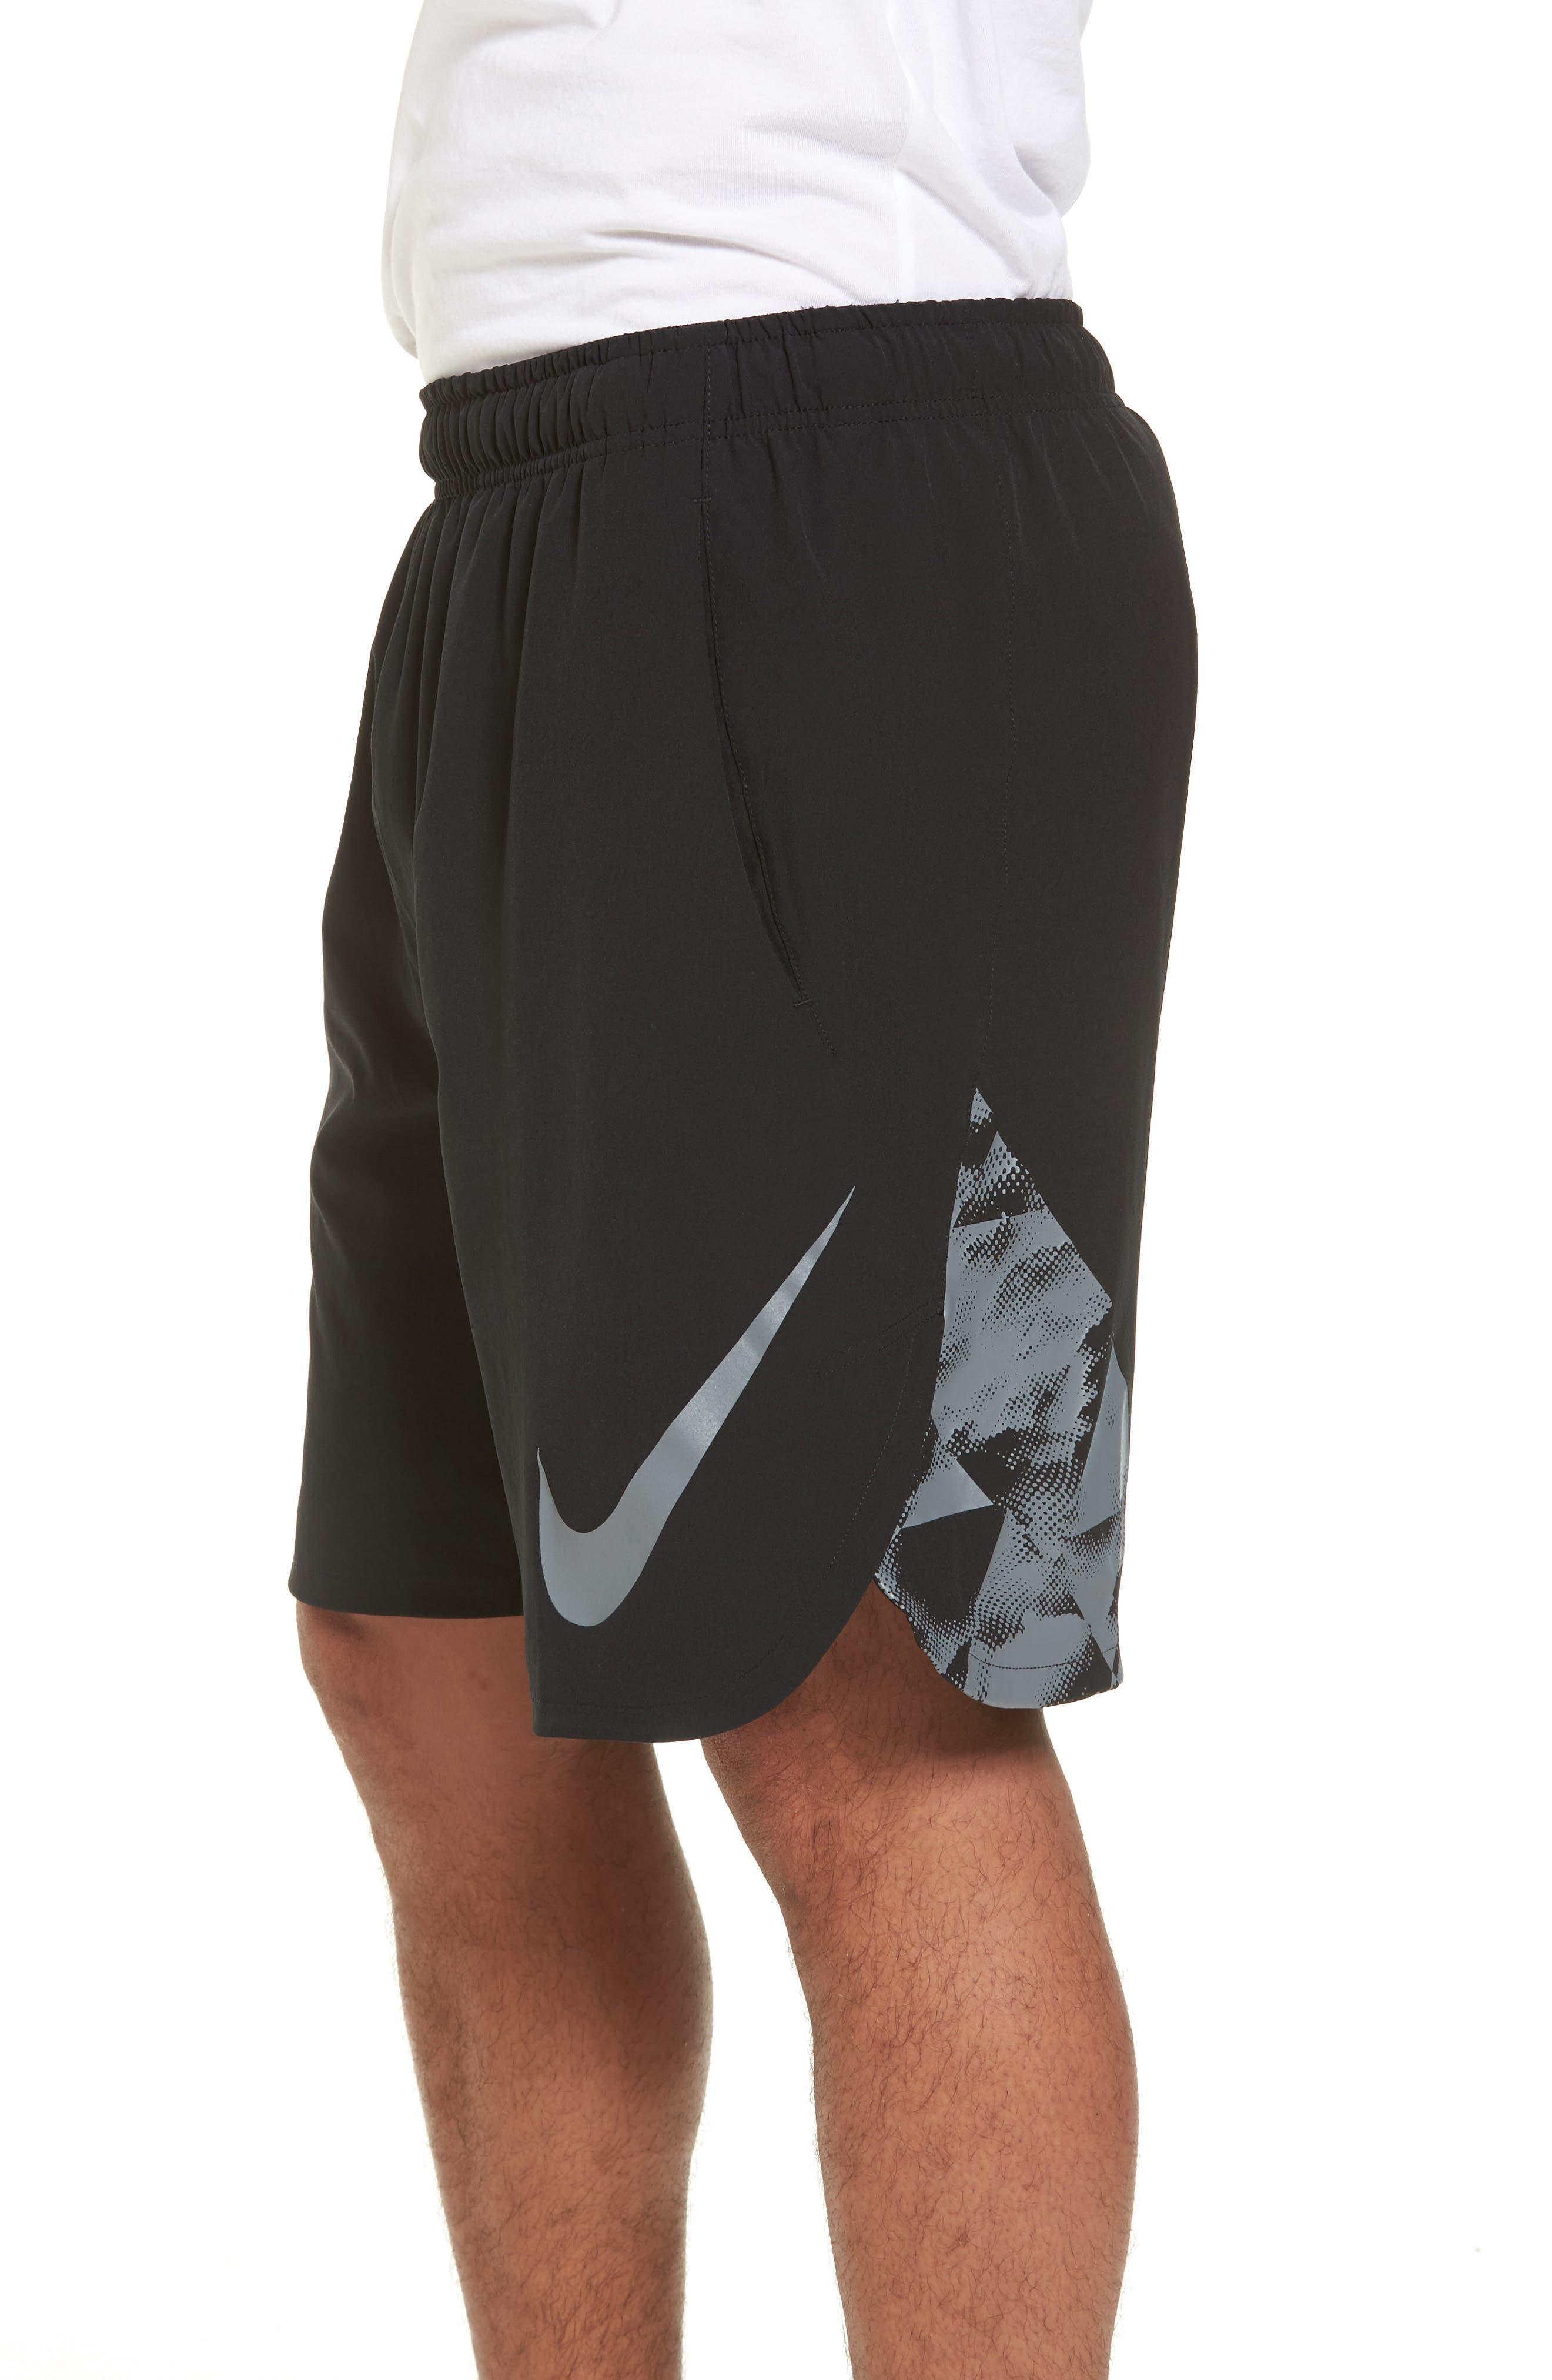 Flex Training Shorts,                             Alternate thumbnail 3, color,                             Black/ Cool Grey